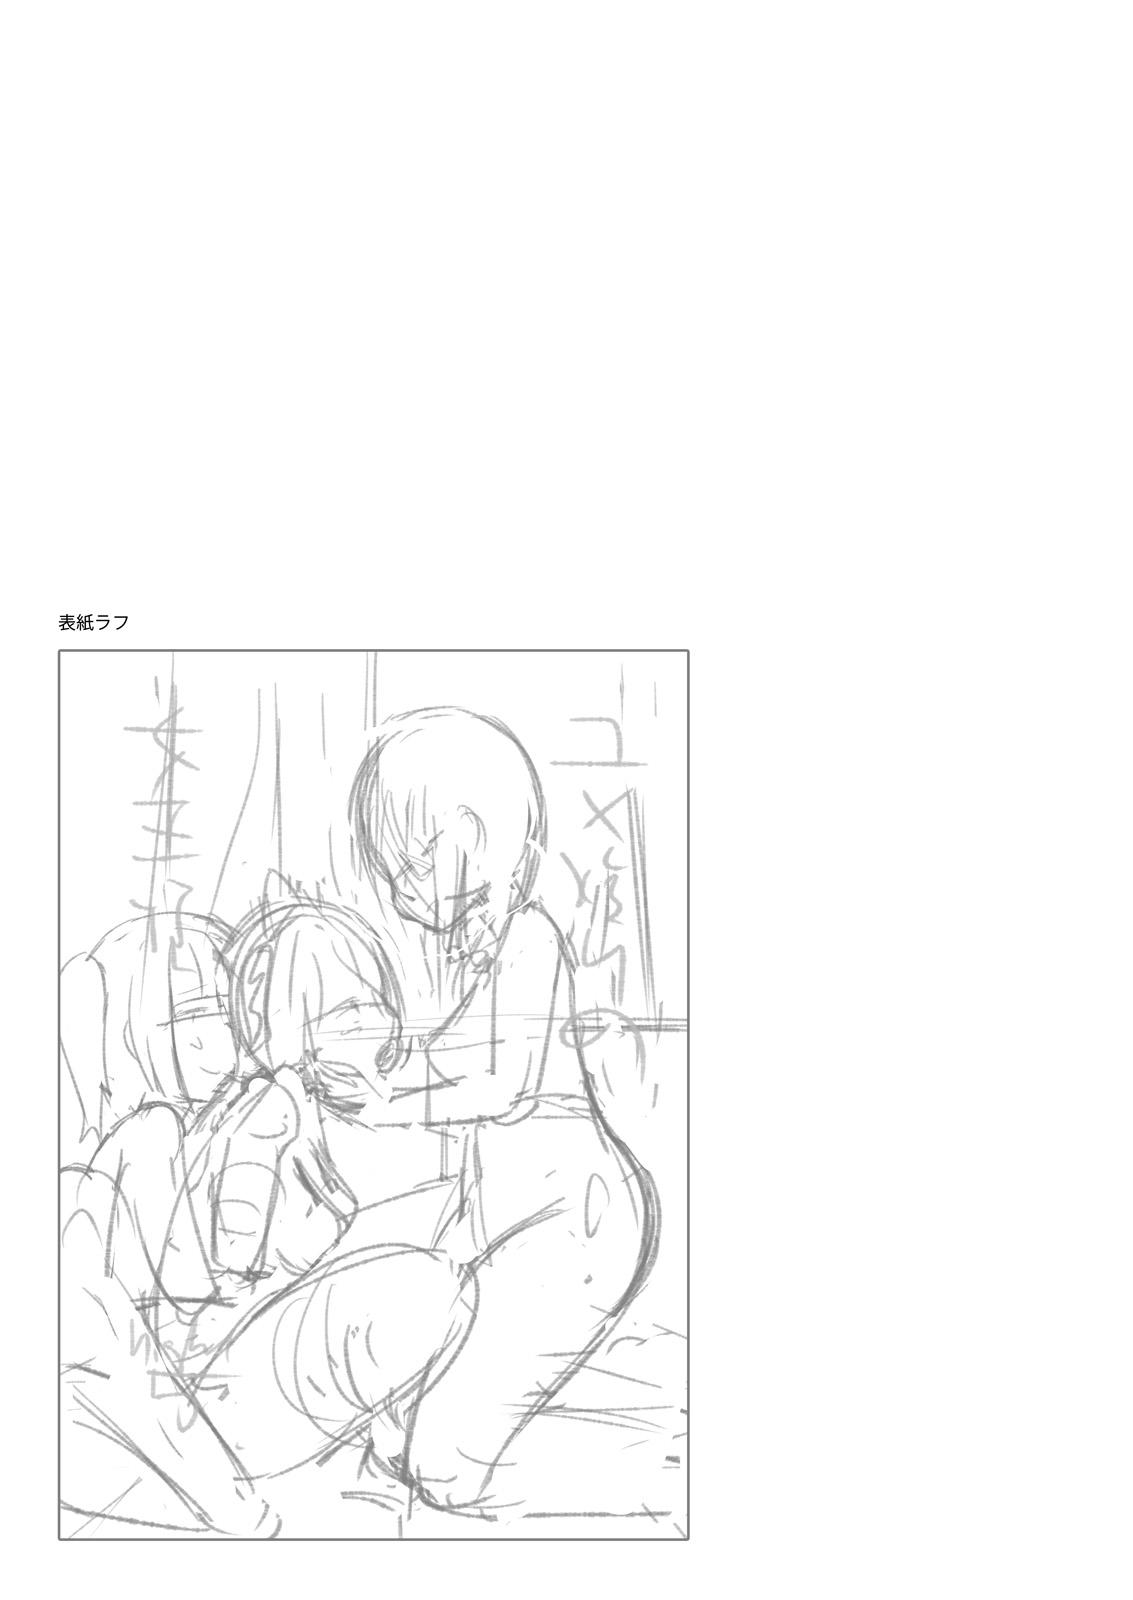 Yumewatari no Mistress night 5 37